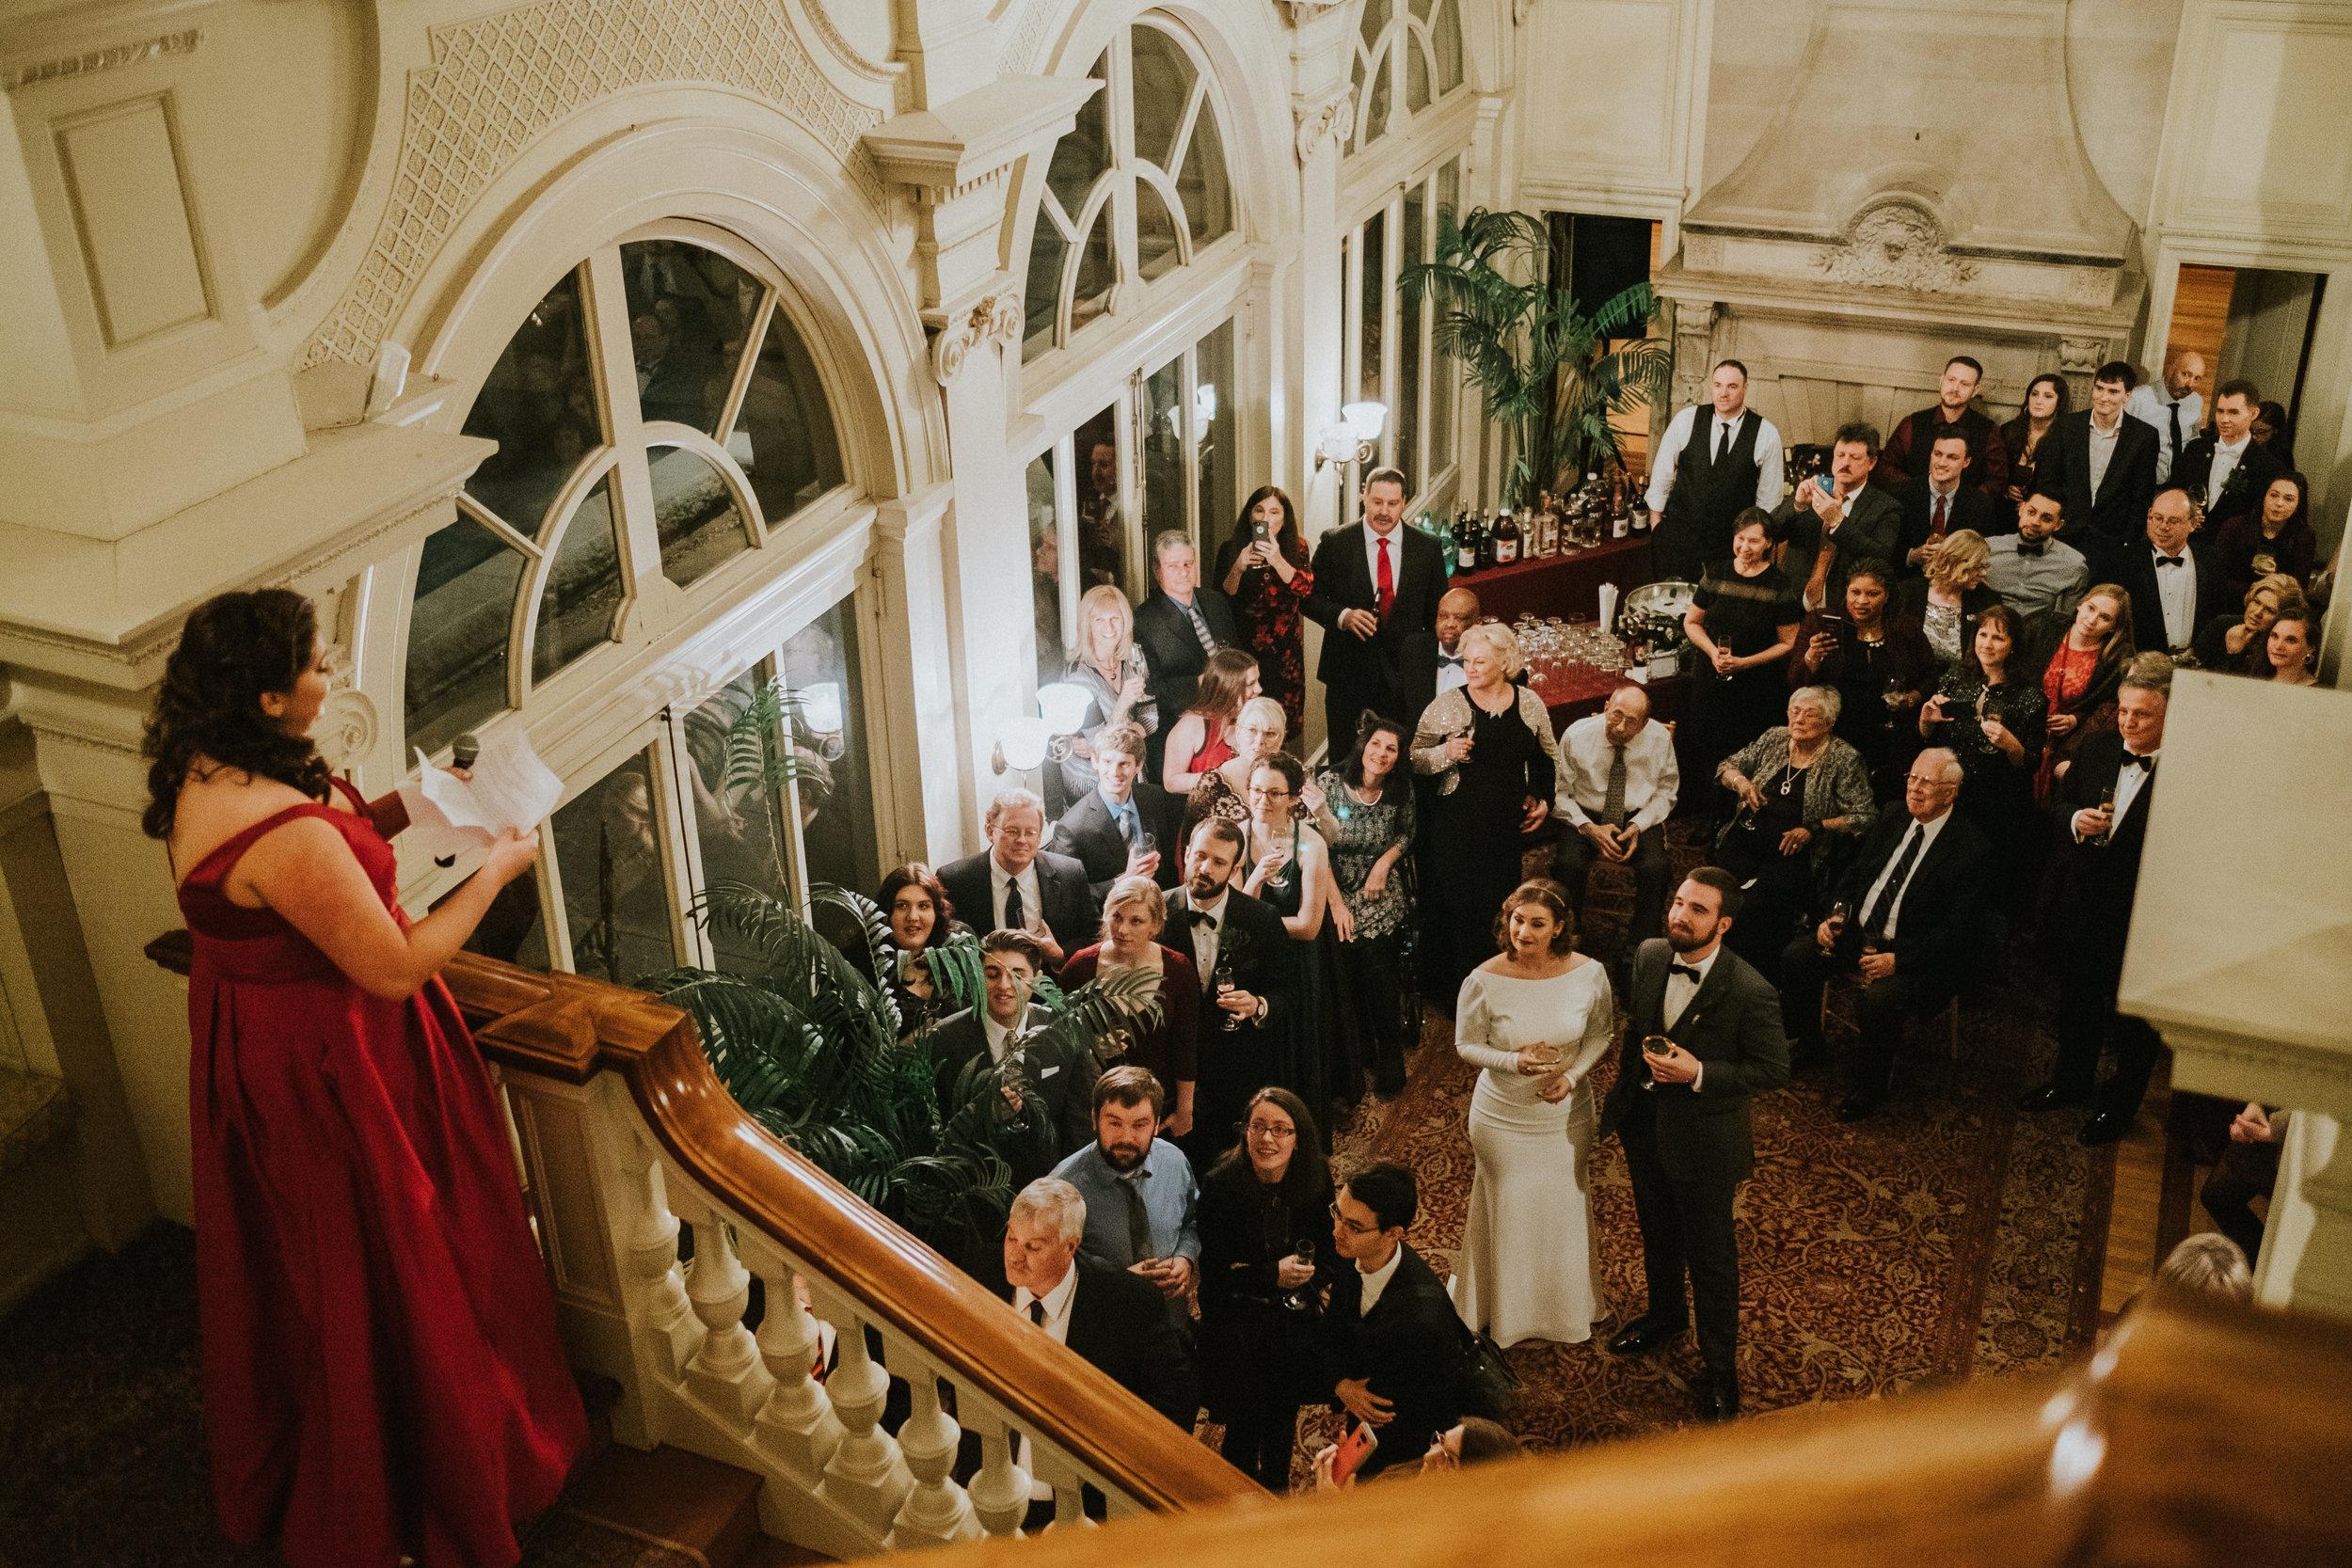 Cairnwood-Estate-Amelia-and-Patrick-Wedding-956.jpg